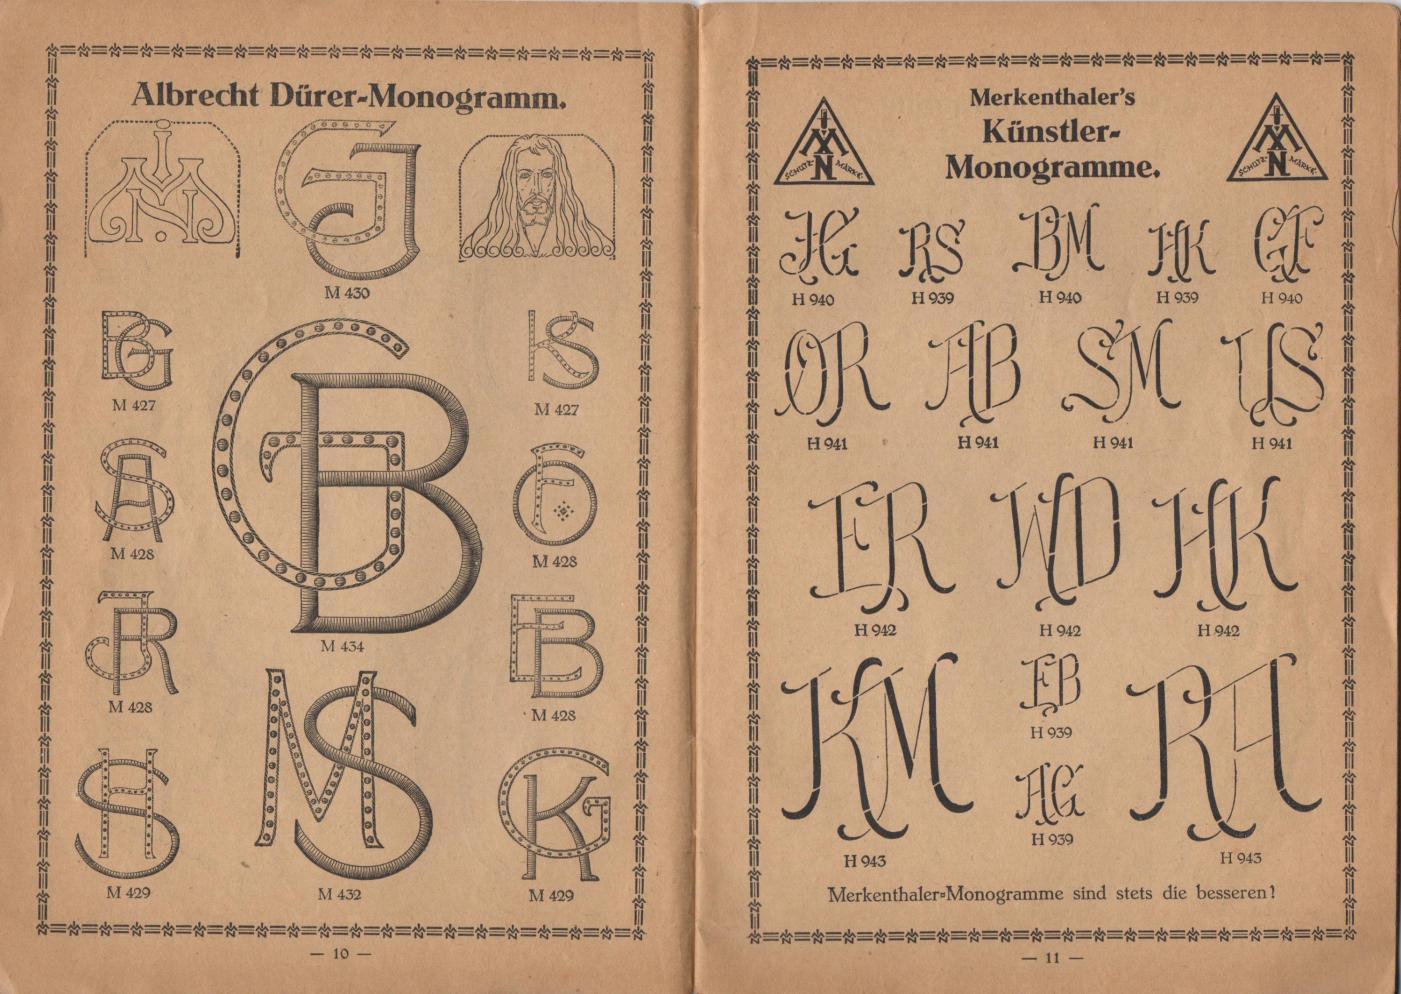 monogramme_10-11.thumb.jpg.48e894755413e421caeda8b306e49b8c.jpg